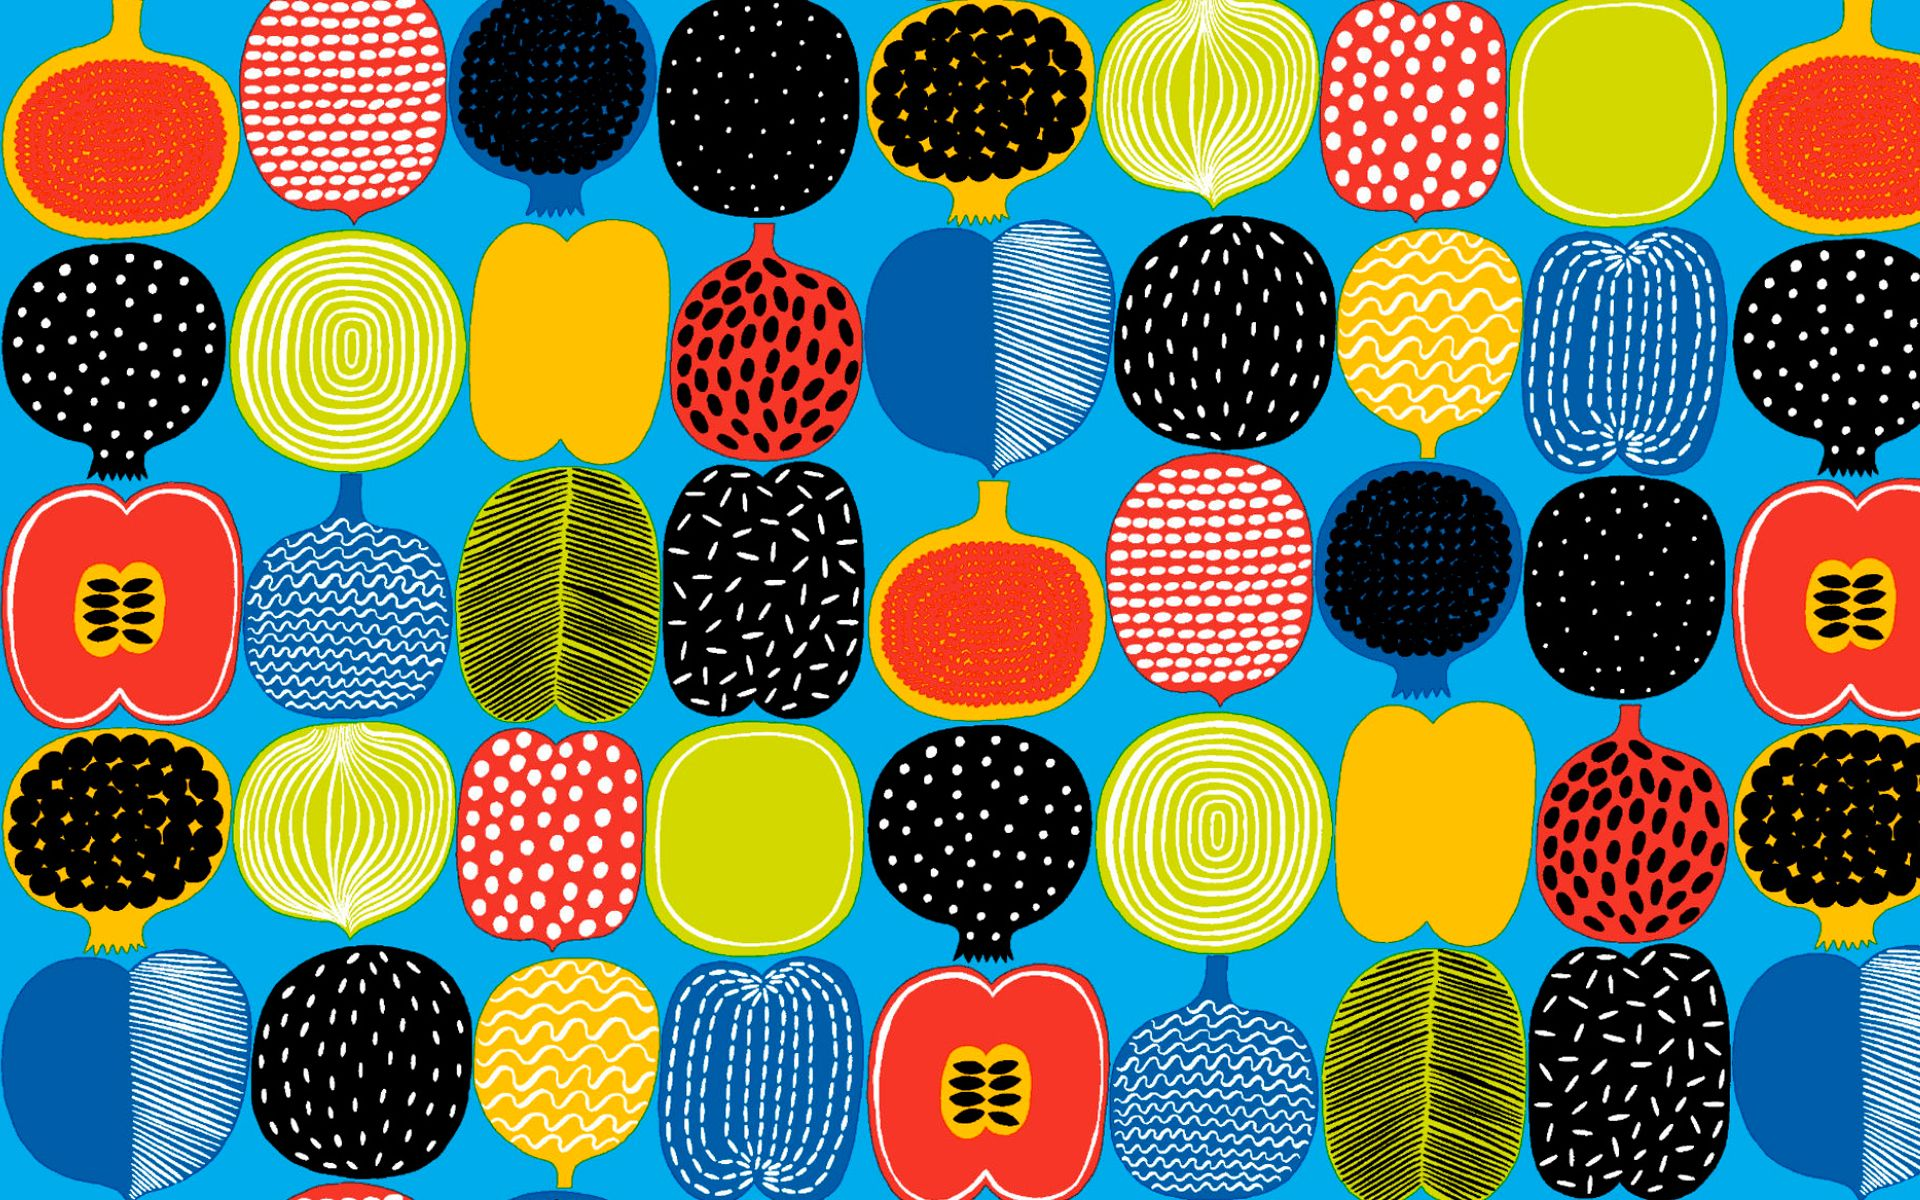 free marimekko desktop wallpapers wallpaper illustration